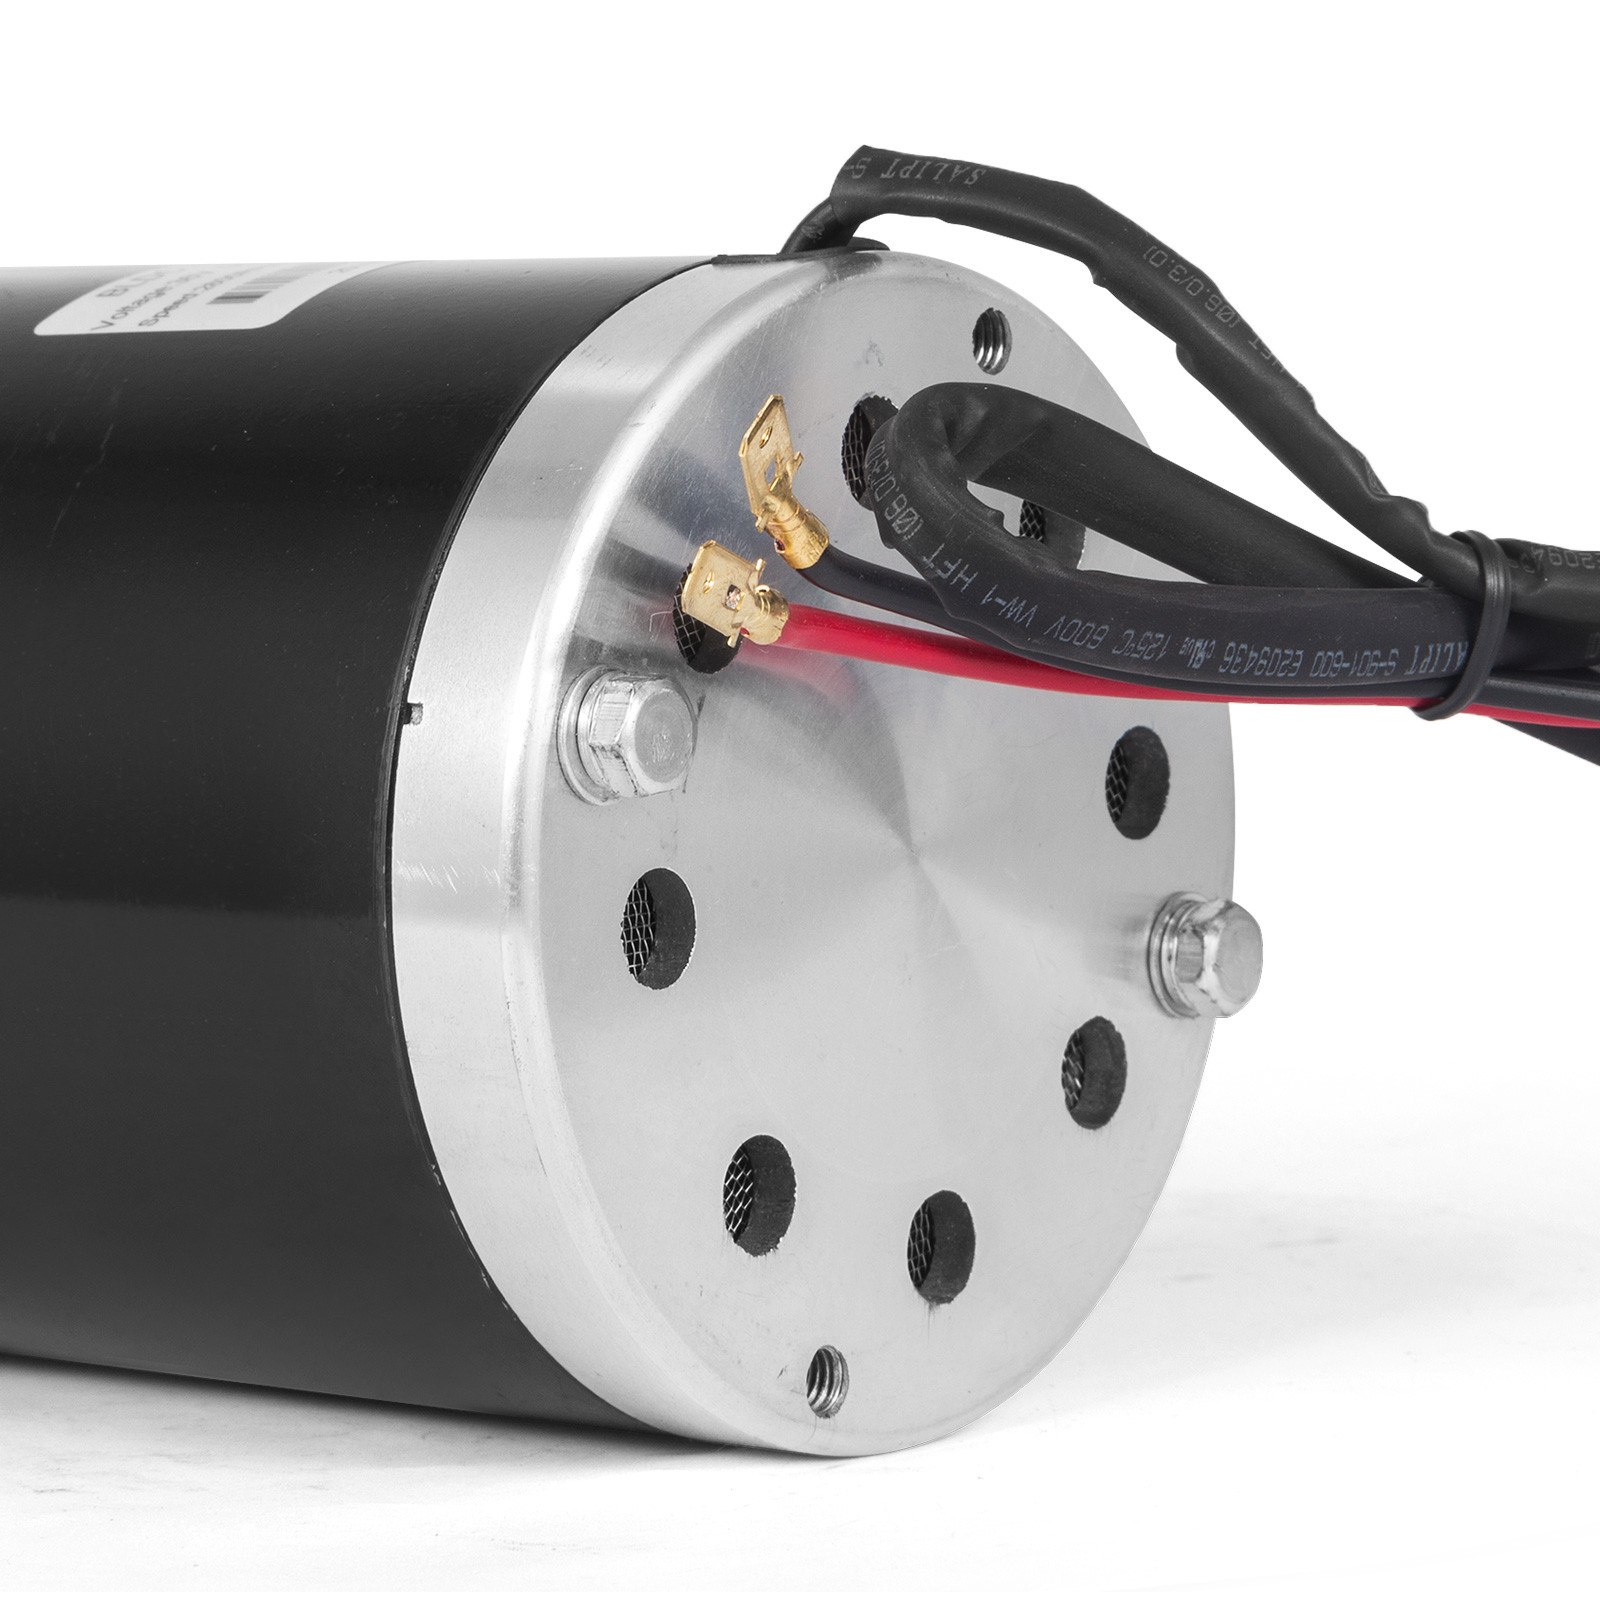 36v-Electric-Motor-controller-throttle-kit-f-Scooter-E-Scooter-ATV-Permanent thumbnail 107